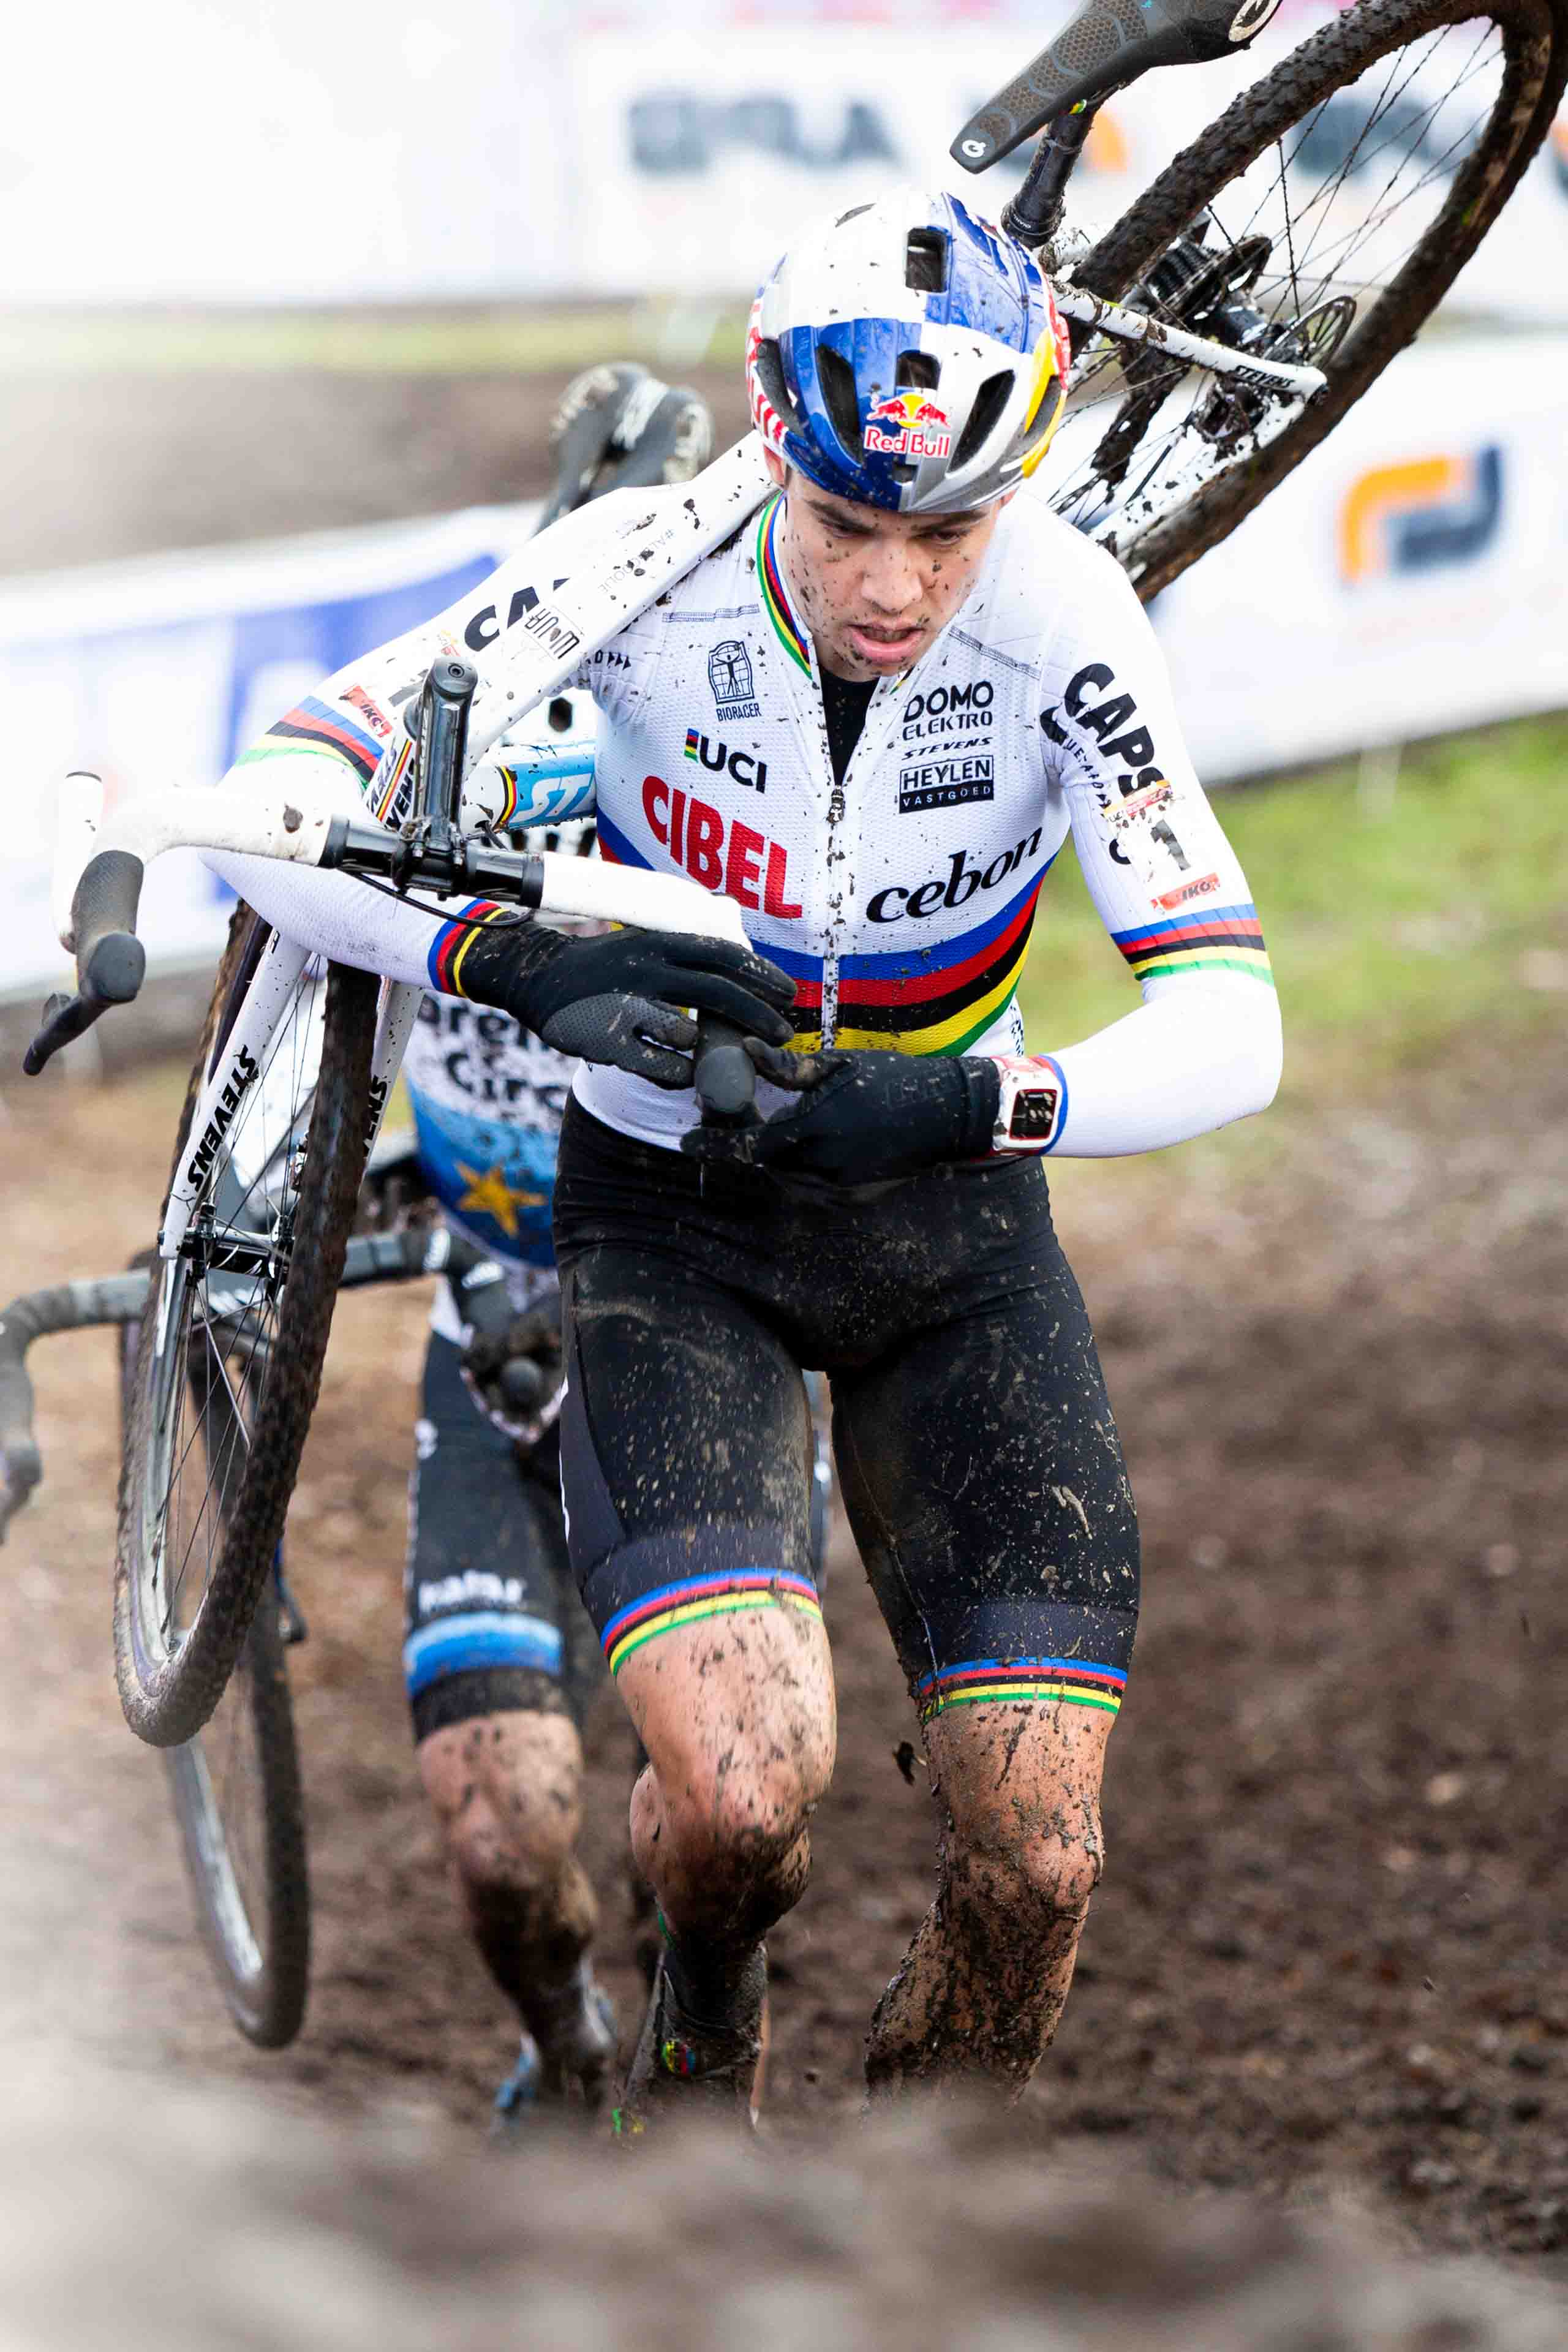 Cyclocross gudok sportfotografie